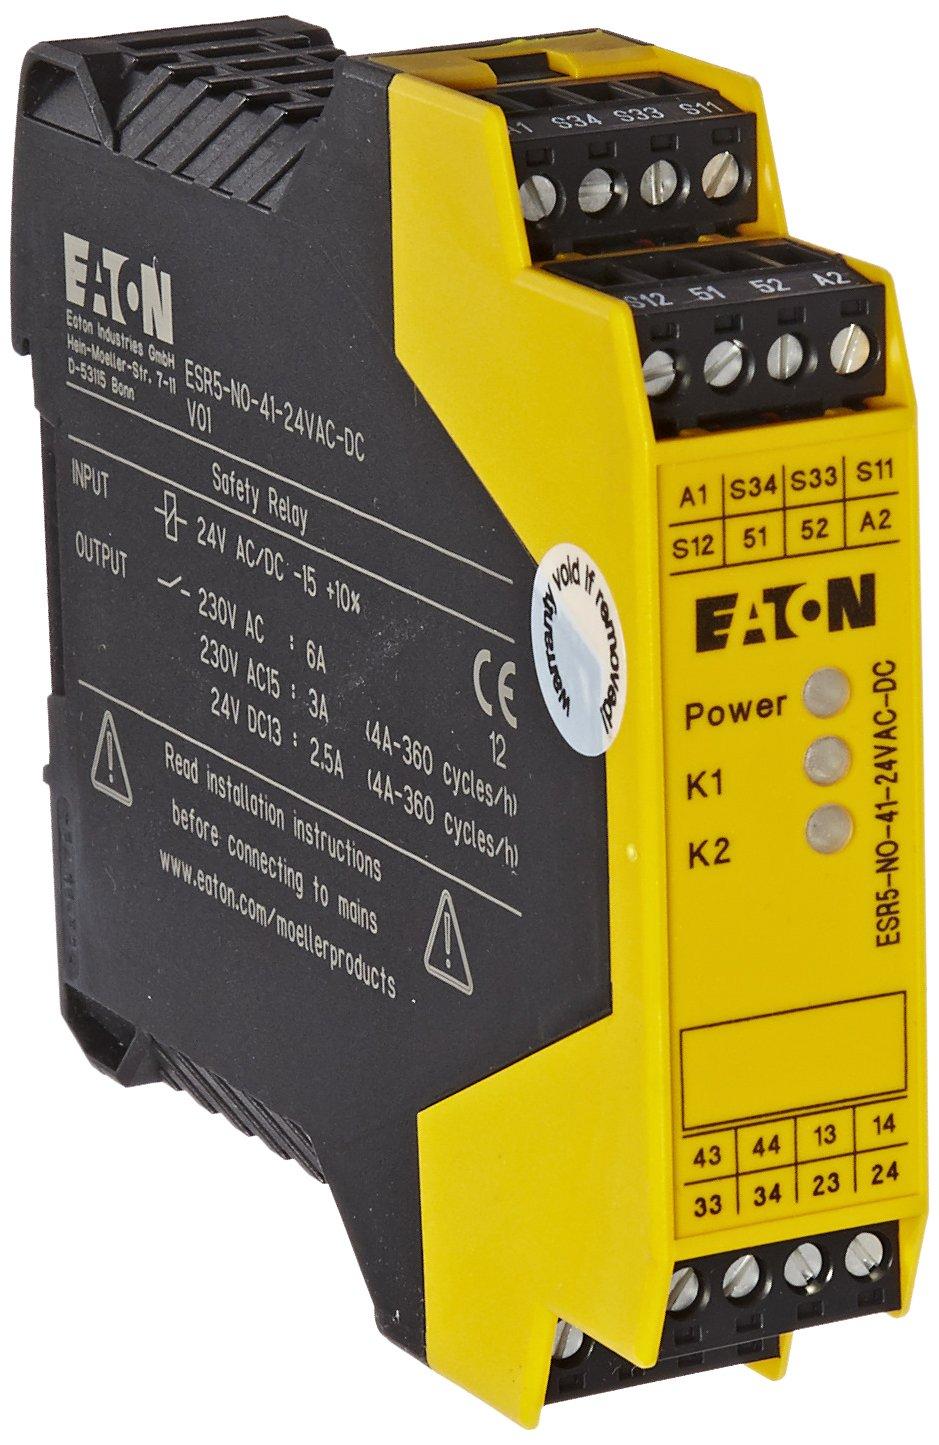 Eaton ESR5-NO-41-24VAC-DC Safety Relay, Single Channel Main Unit, 4 NO Safety Output, 1 NC Signal Output, 24 VAC/DC Control Voltage